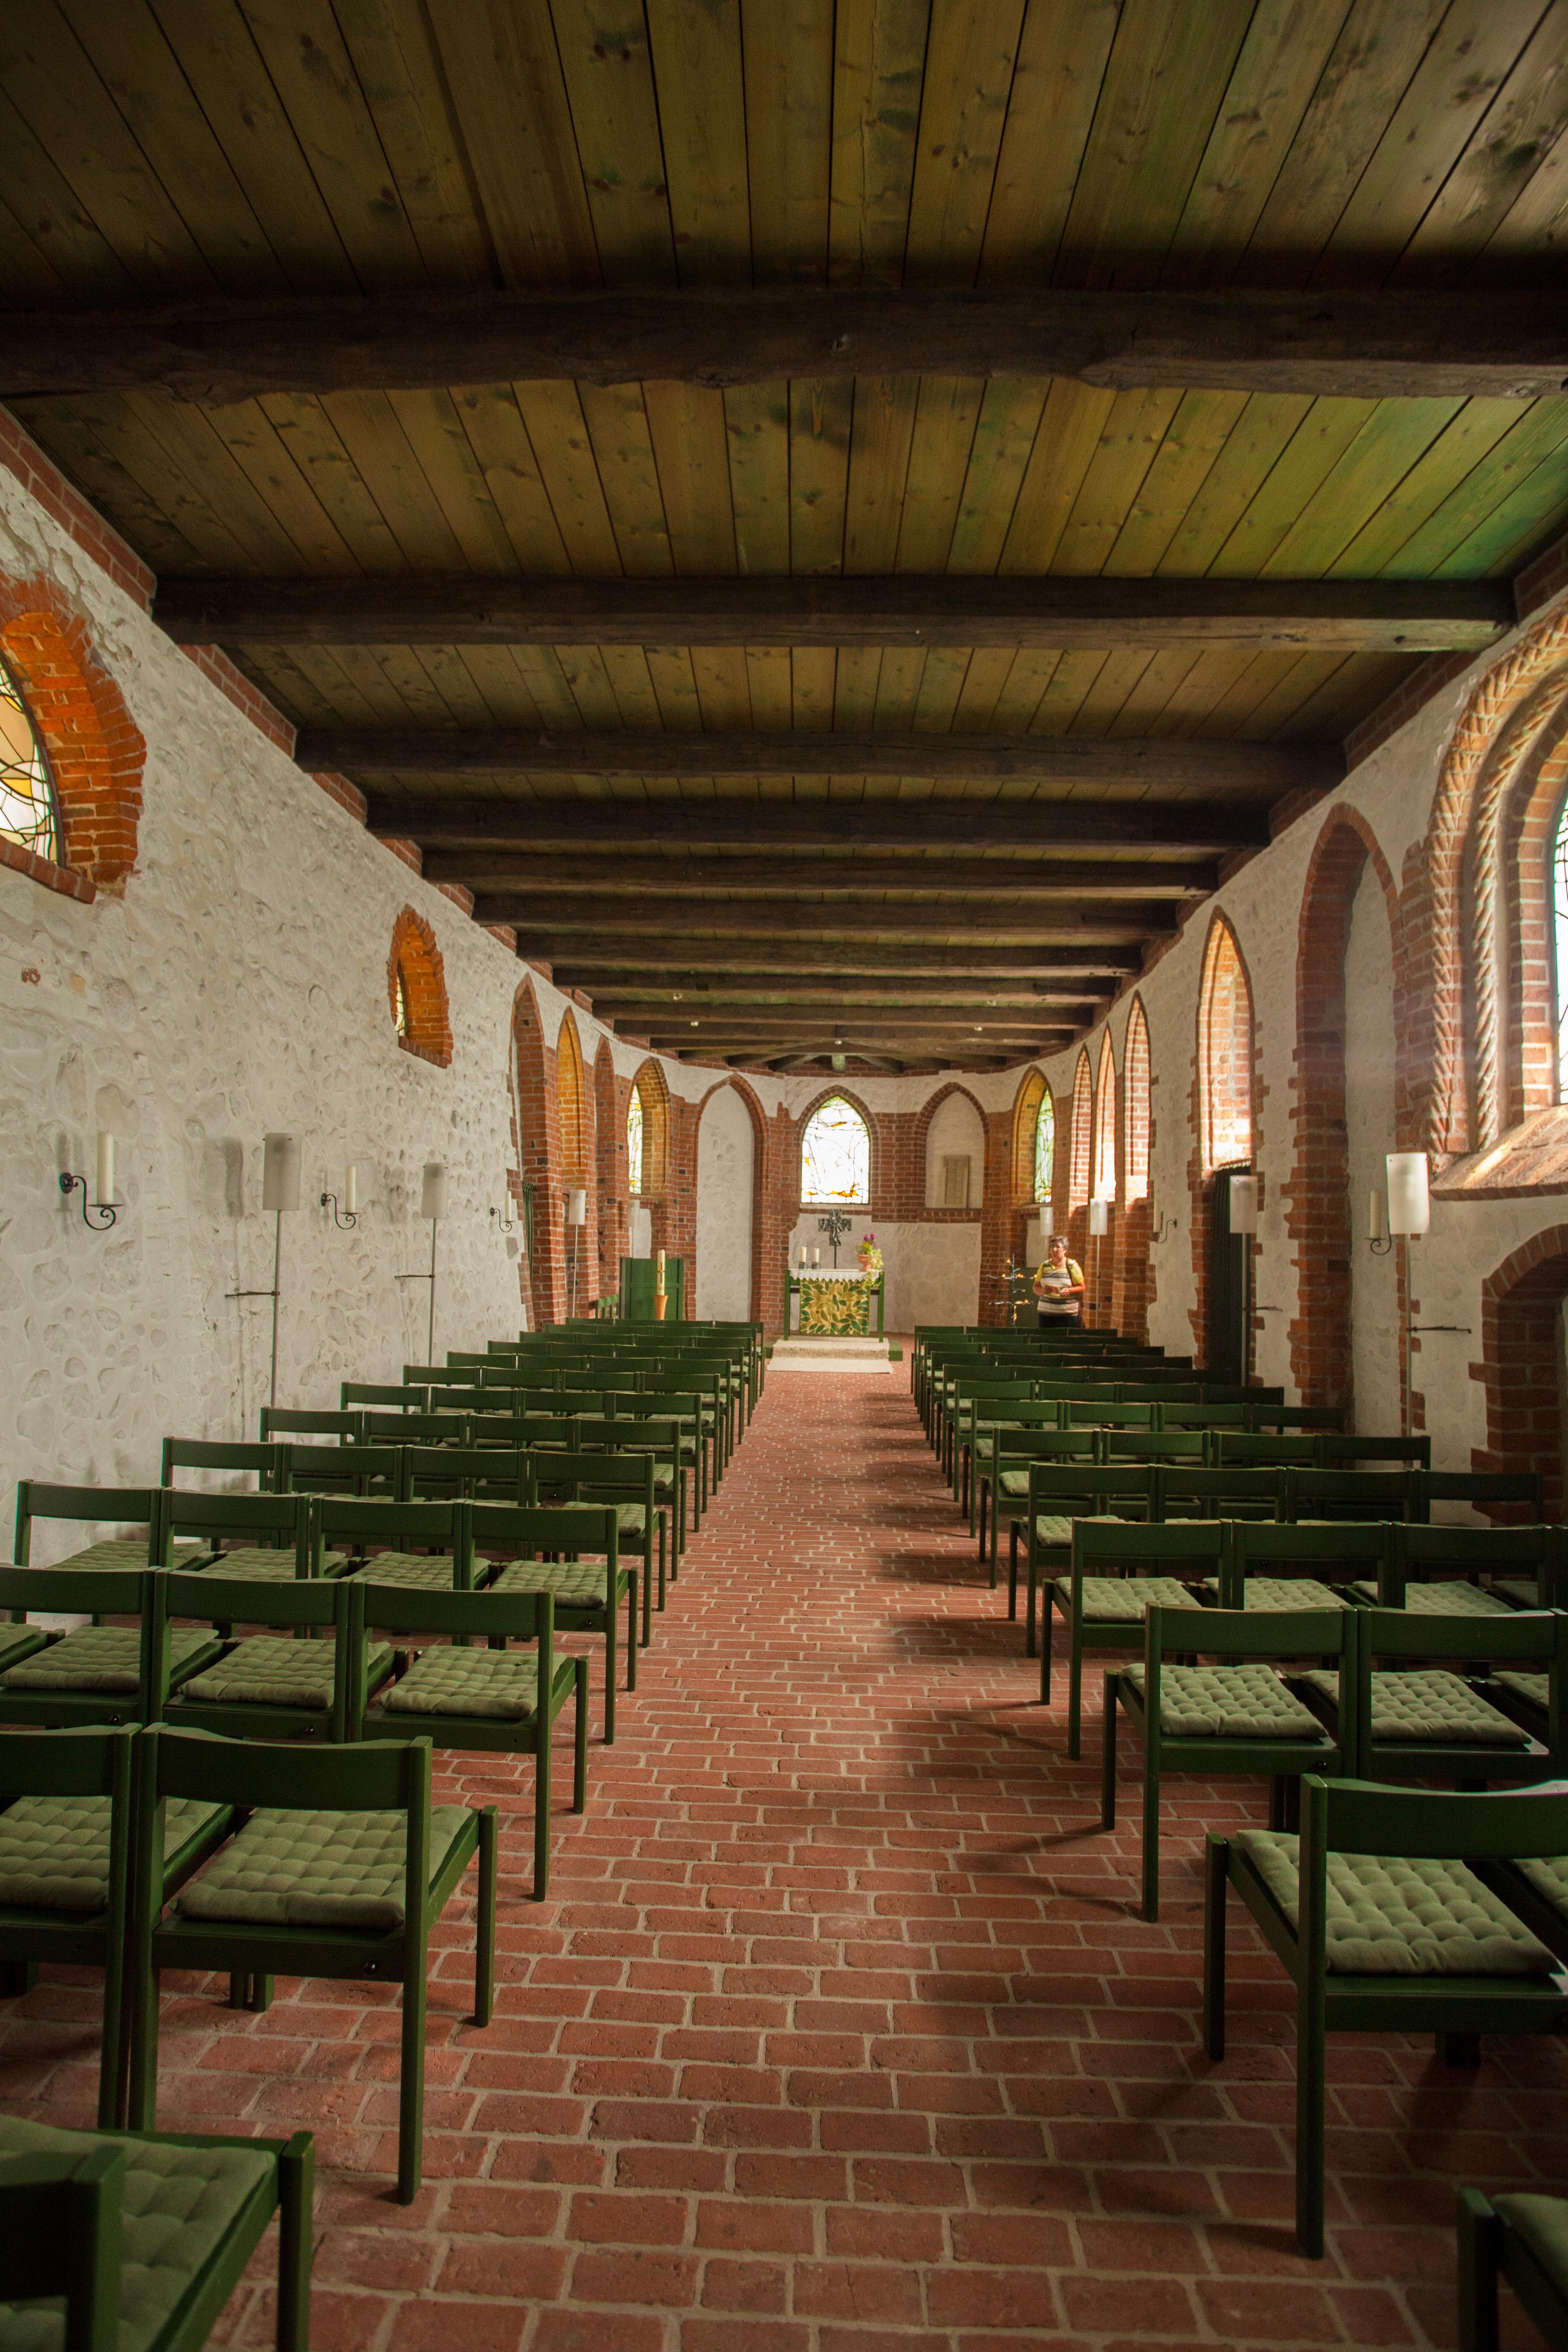 bispingen-kirche-innenraum